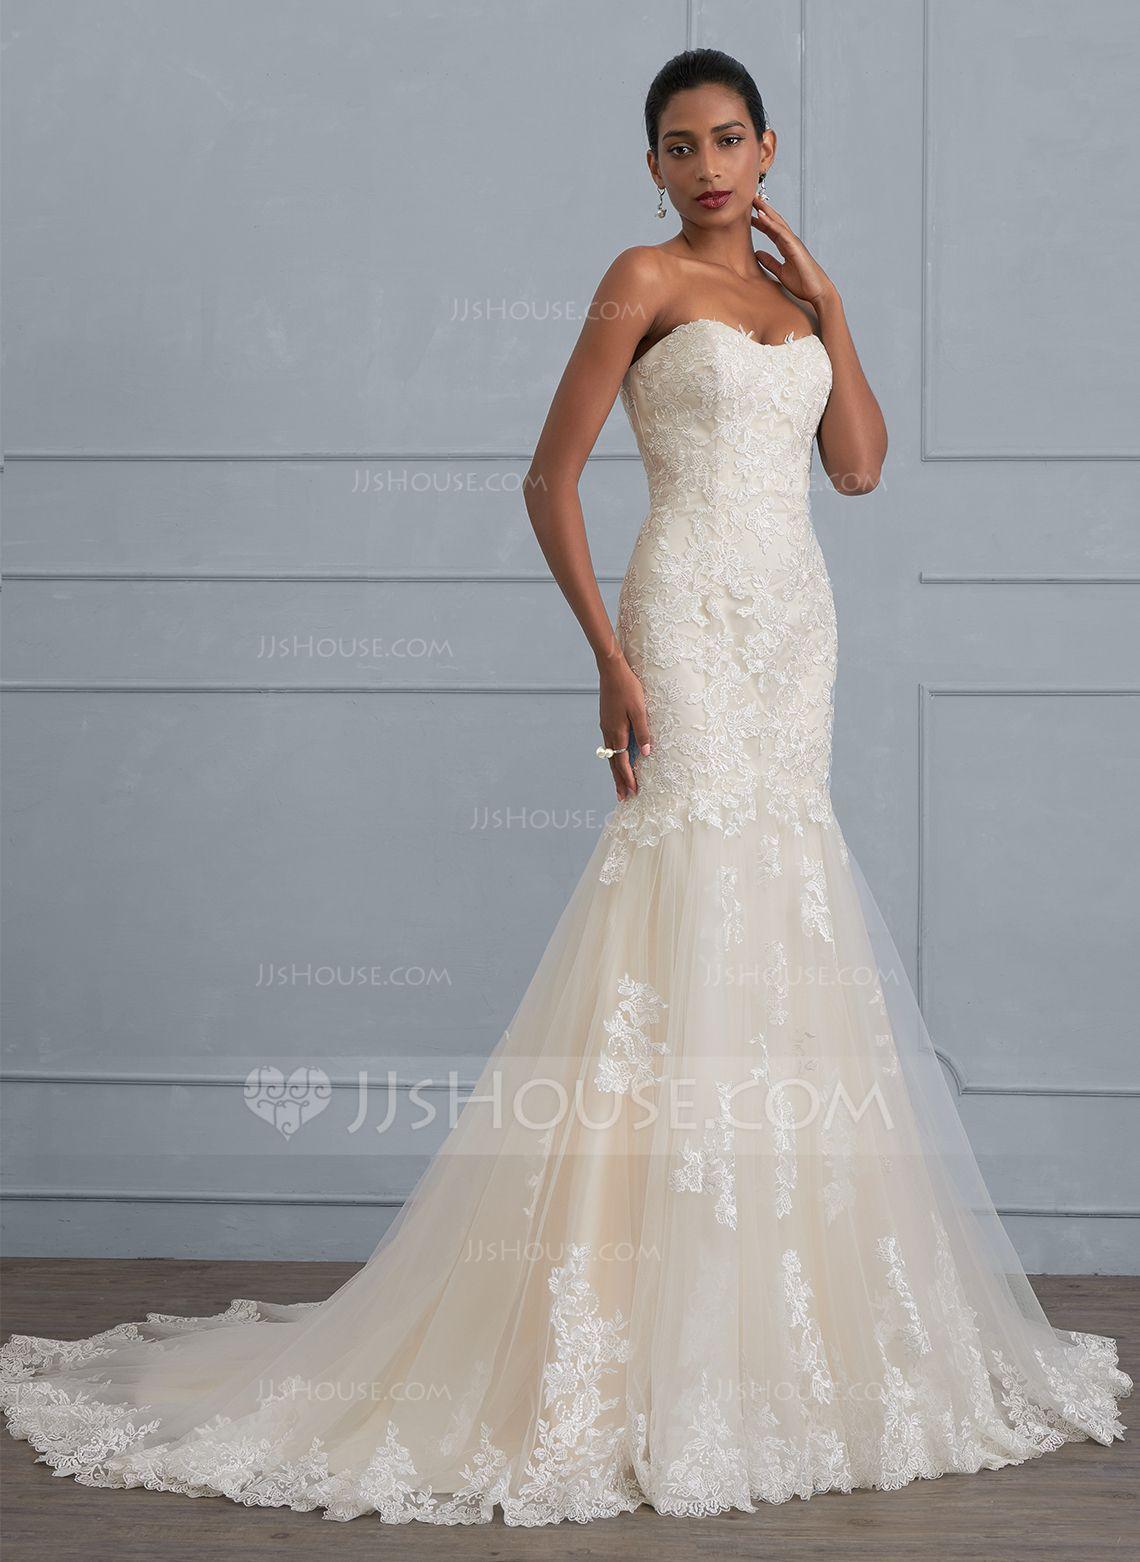 Au 438 00 Trumpet Mermaid Sweetheart Court Train Tulle Lace Wedding Dress Jj S House Trendy Wedding Dresses Wedding Dresses Lace Trumpet Wedding Dress [ 1562 x 1140 Pixel ]